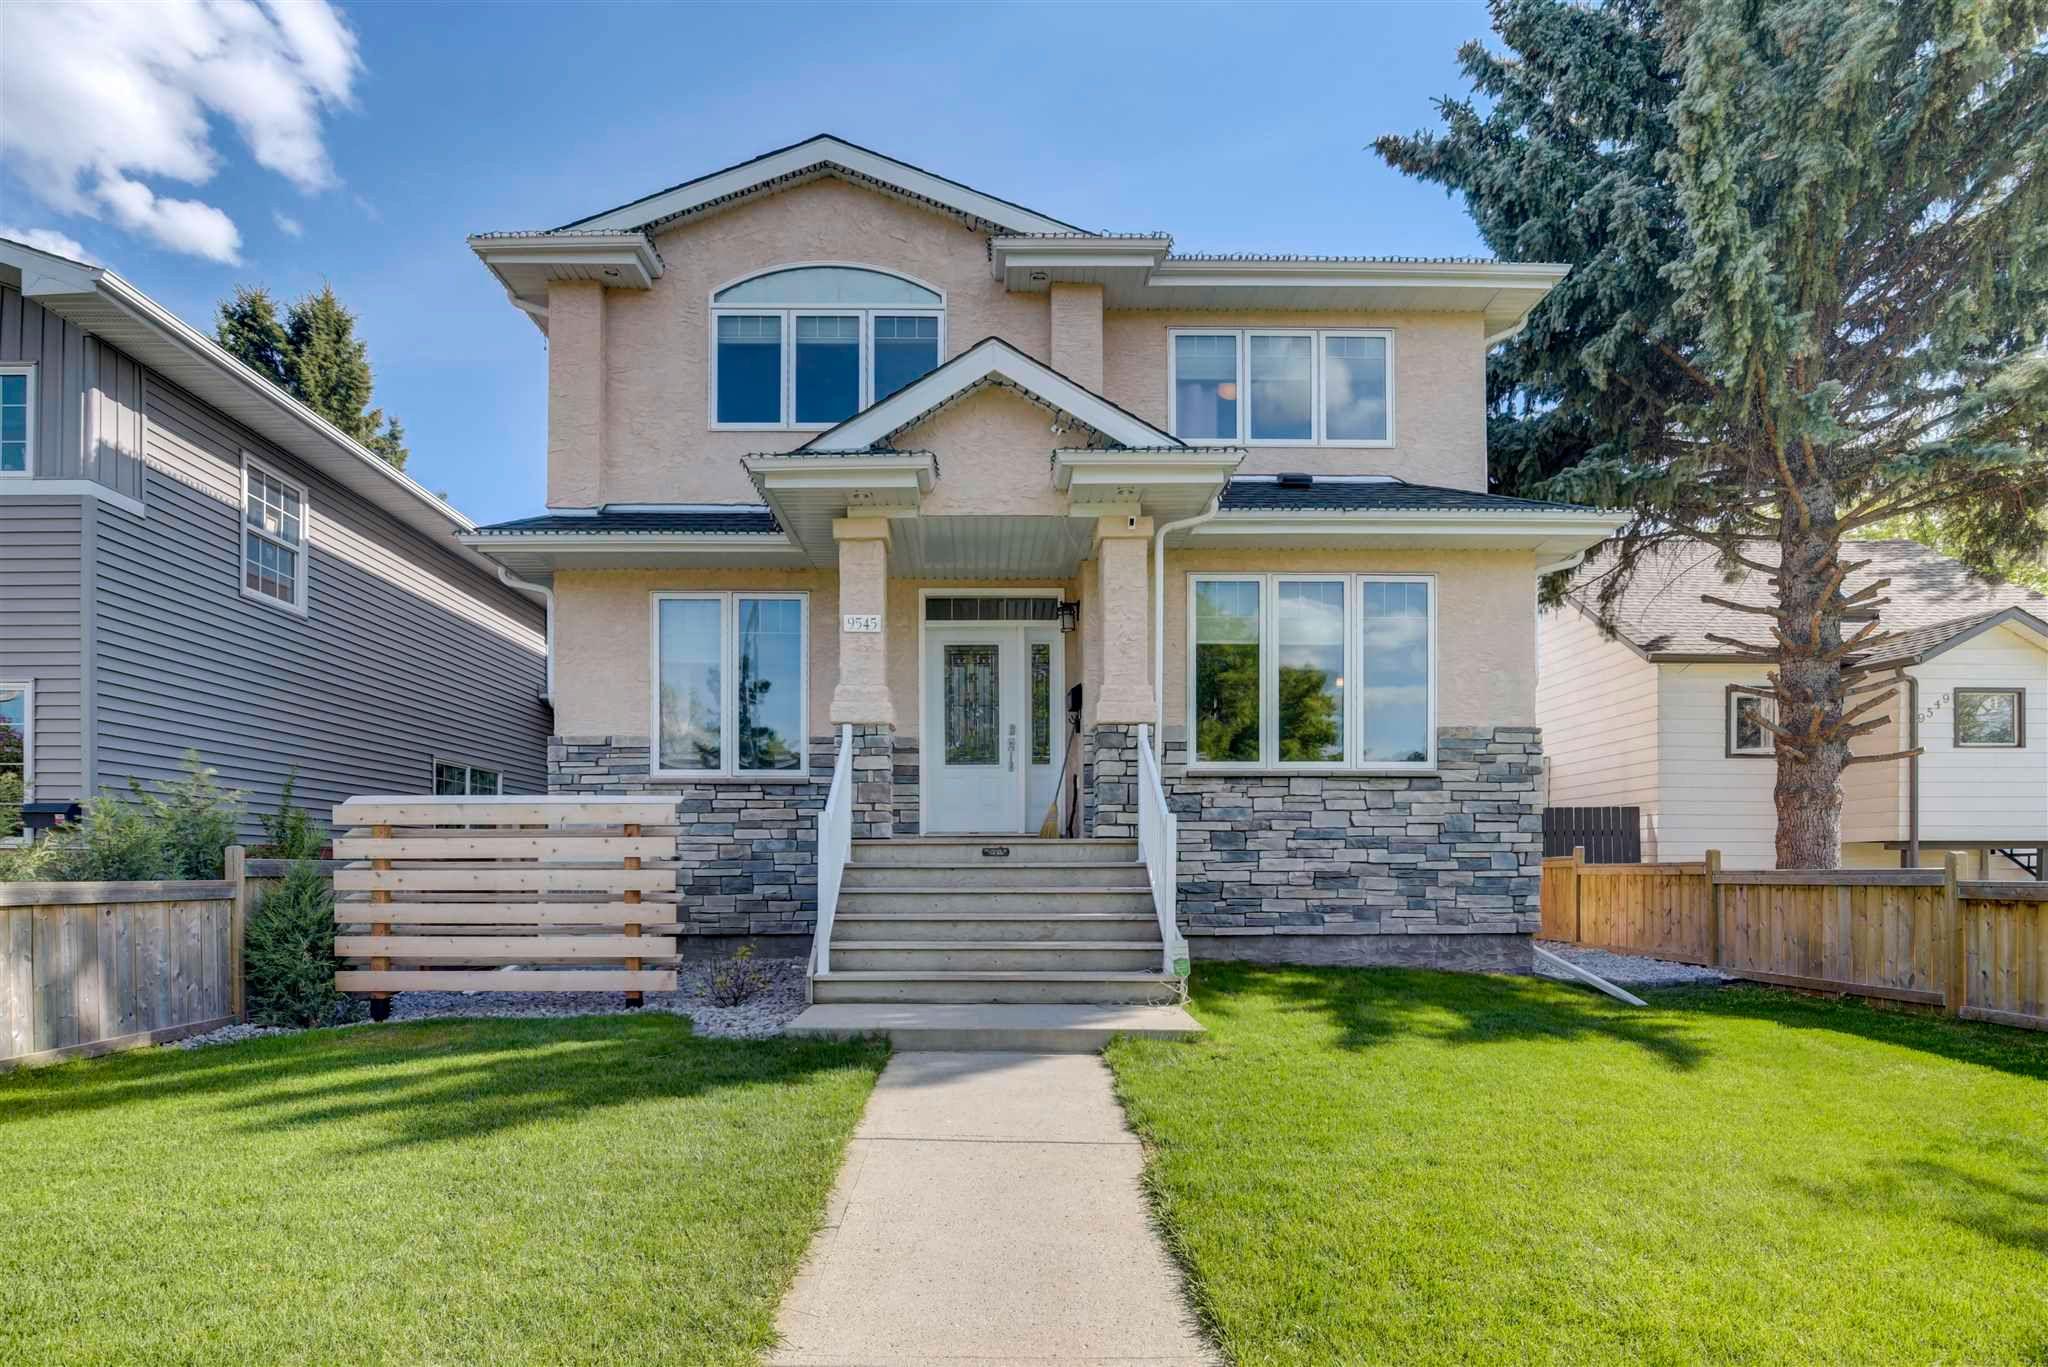 Main Photo: 9545 74 Avenue in Edmonton: Zone 17 House for sale : MLS®# E4246998